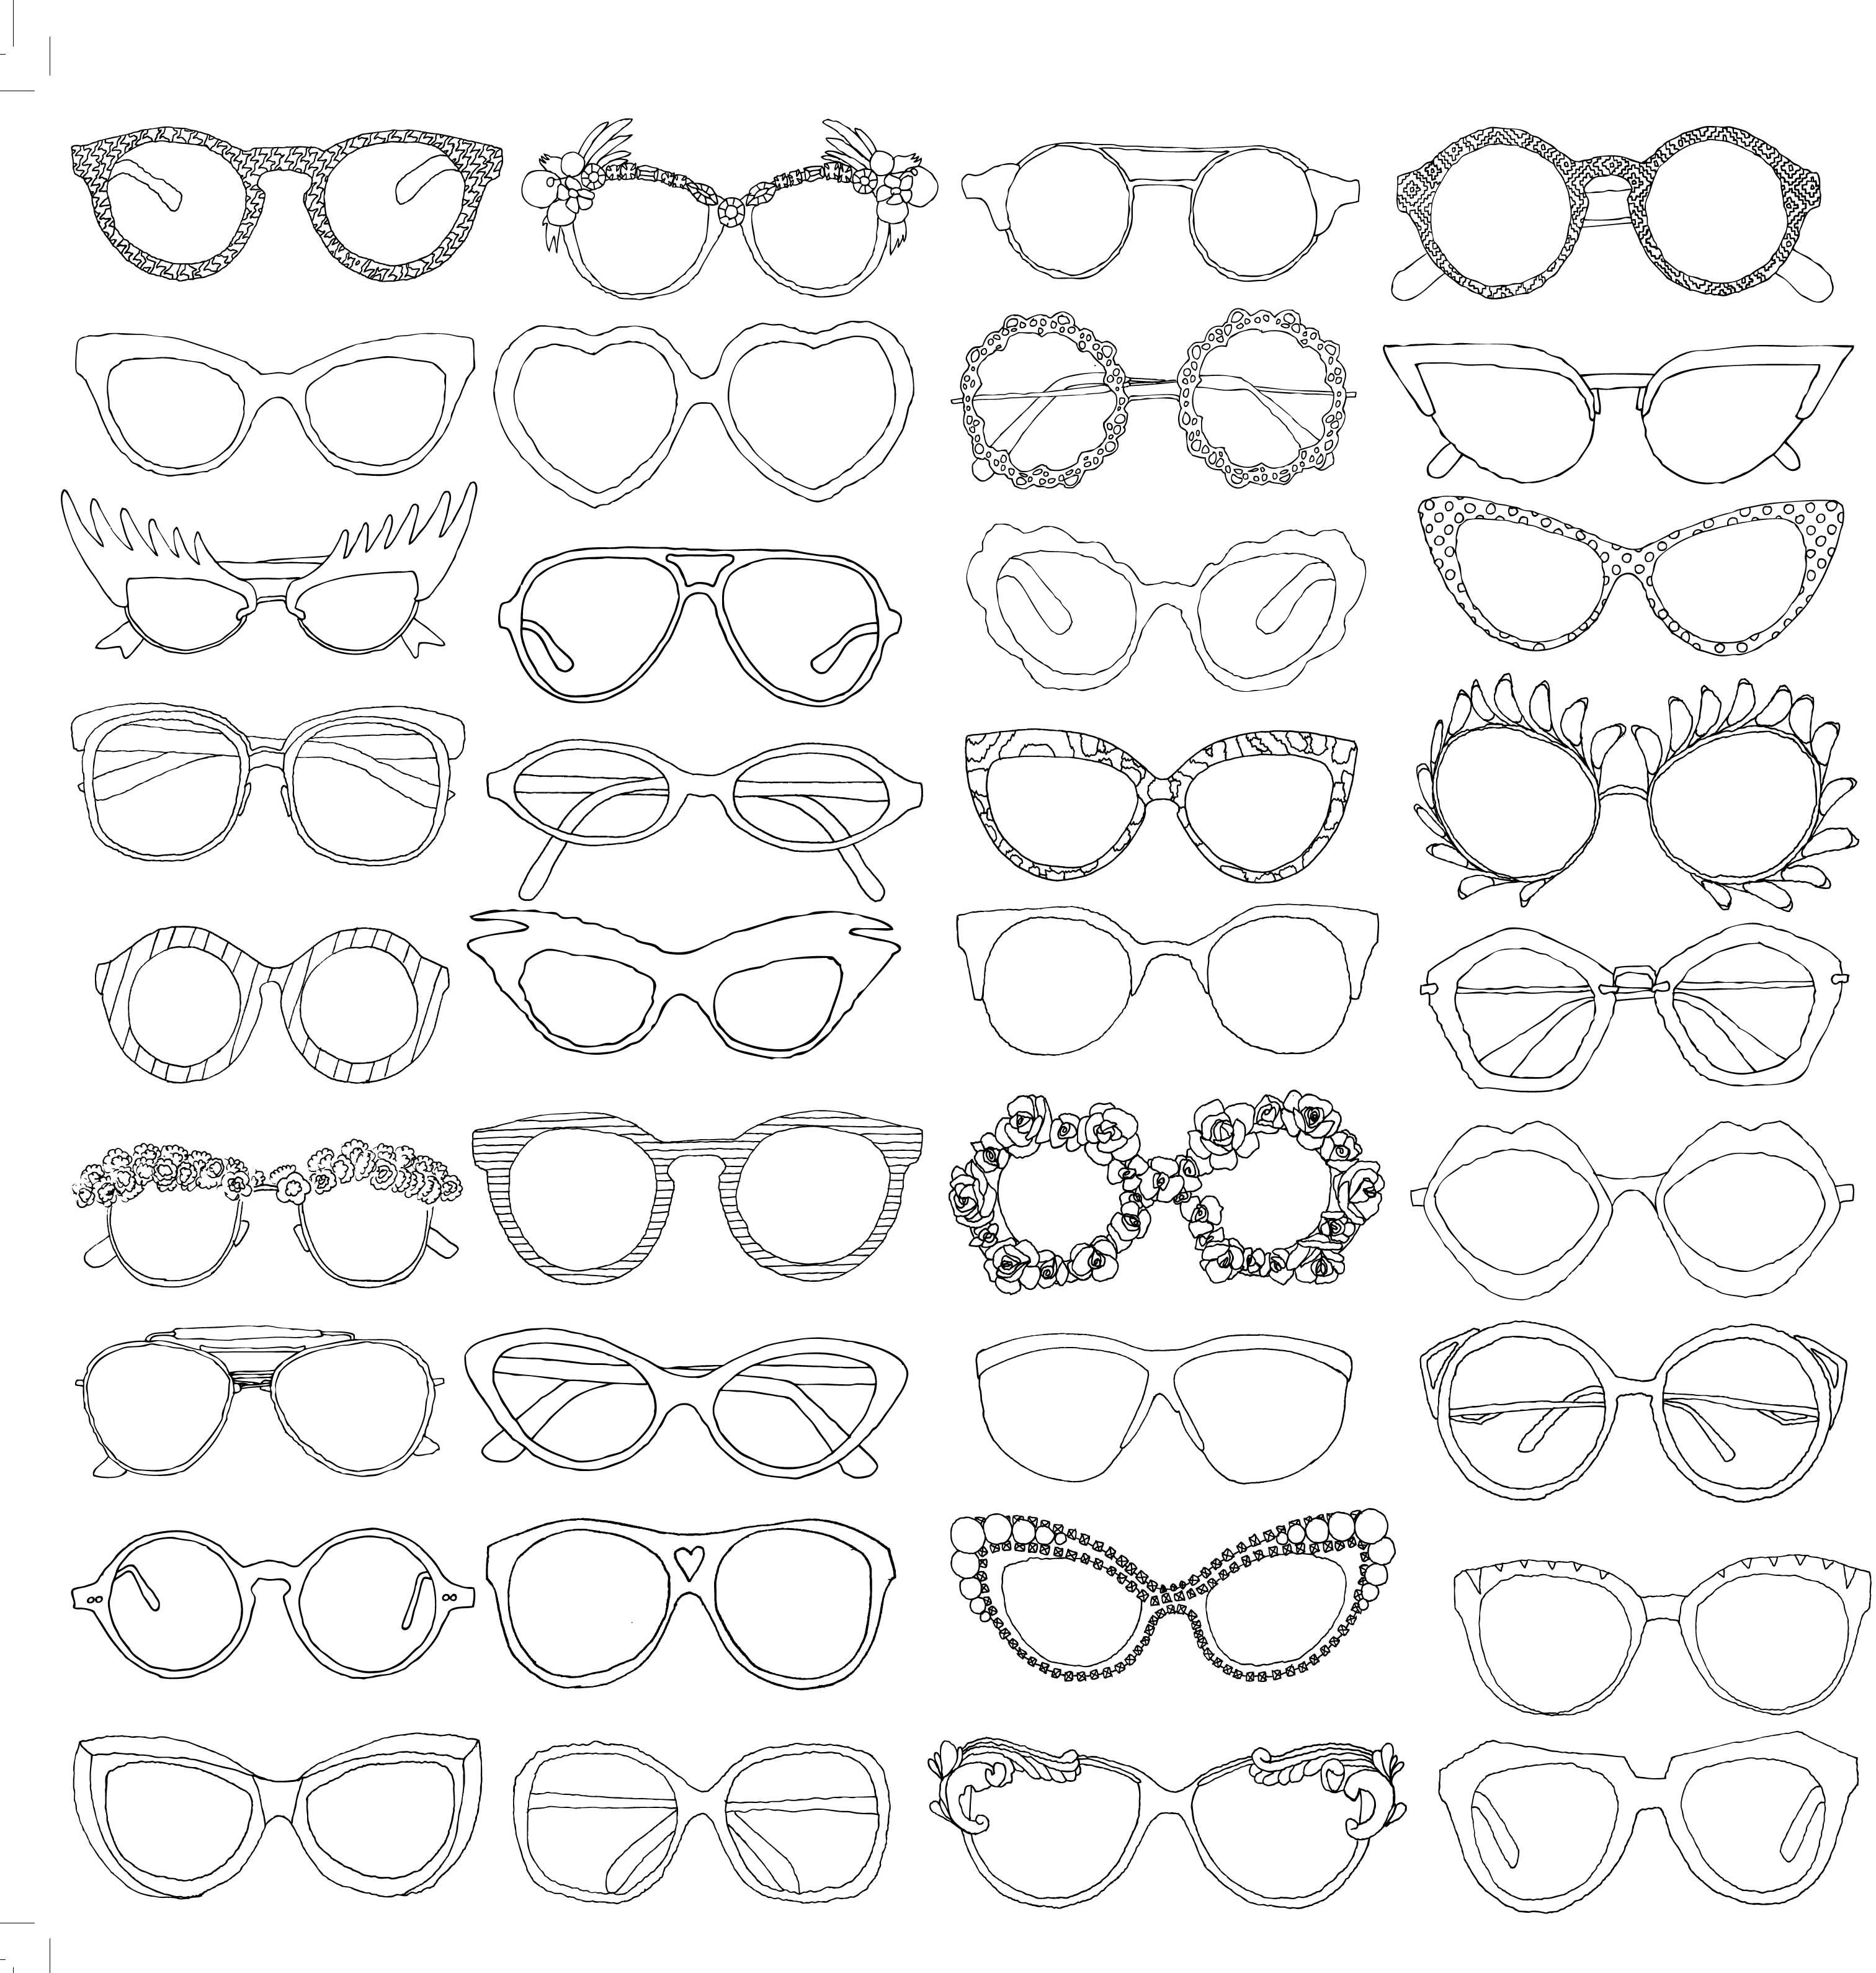 Lunettes glasses coloriage adulte anti stress paris - Dessin anti stress ...